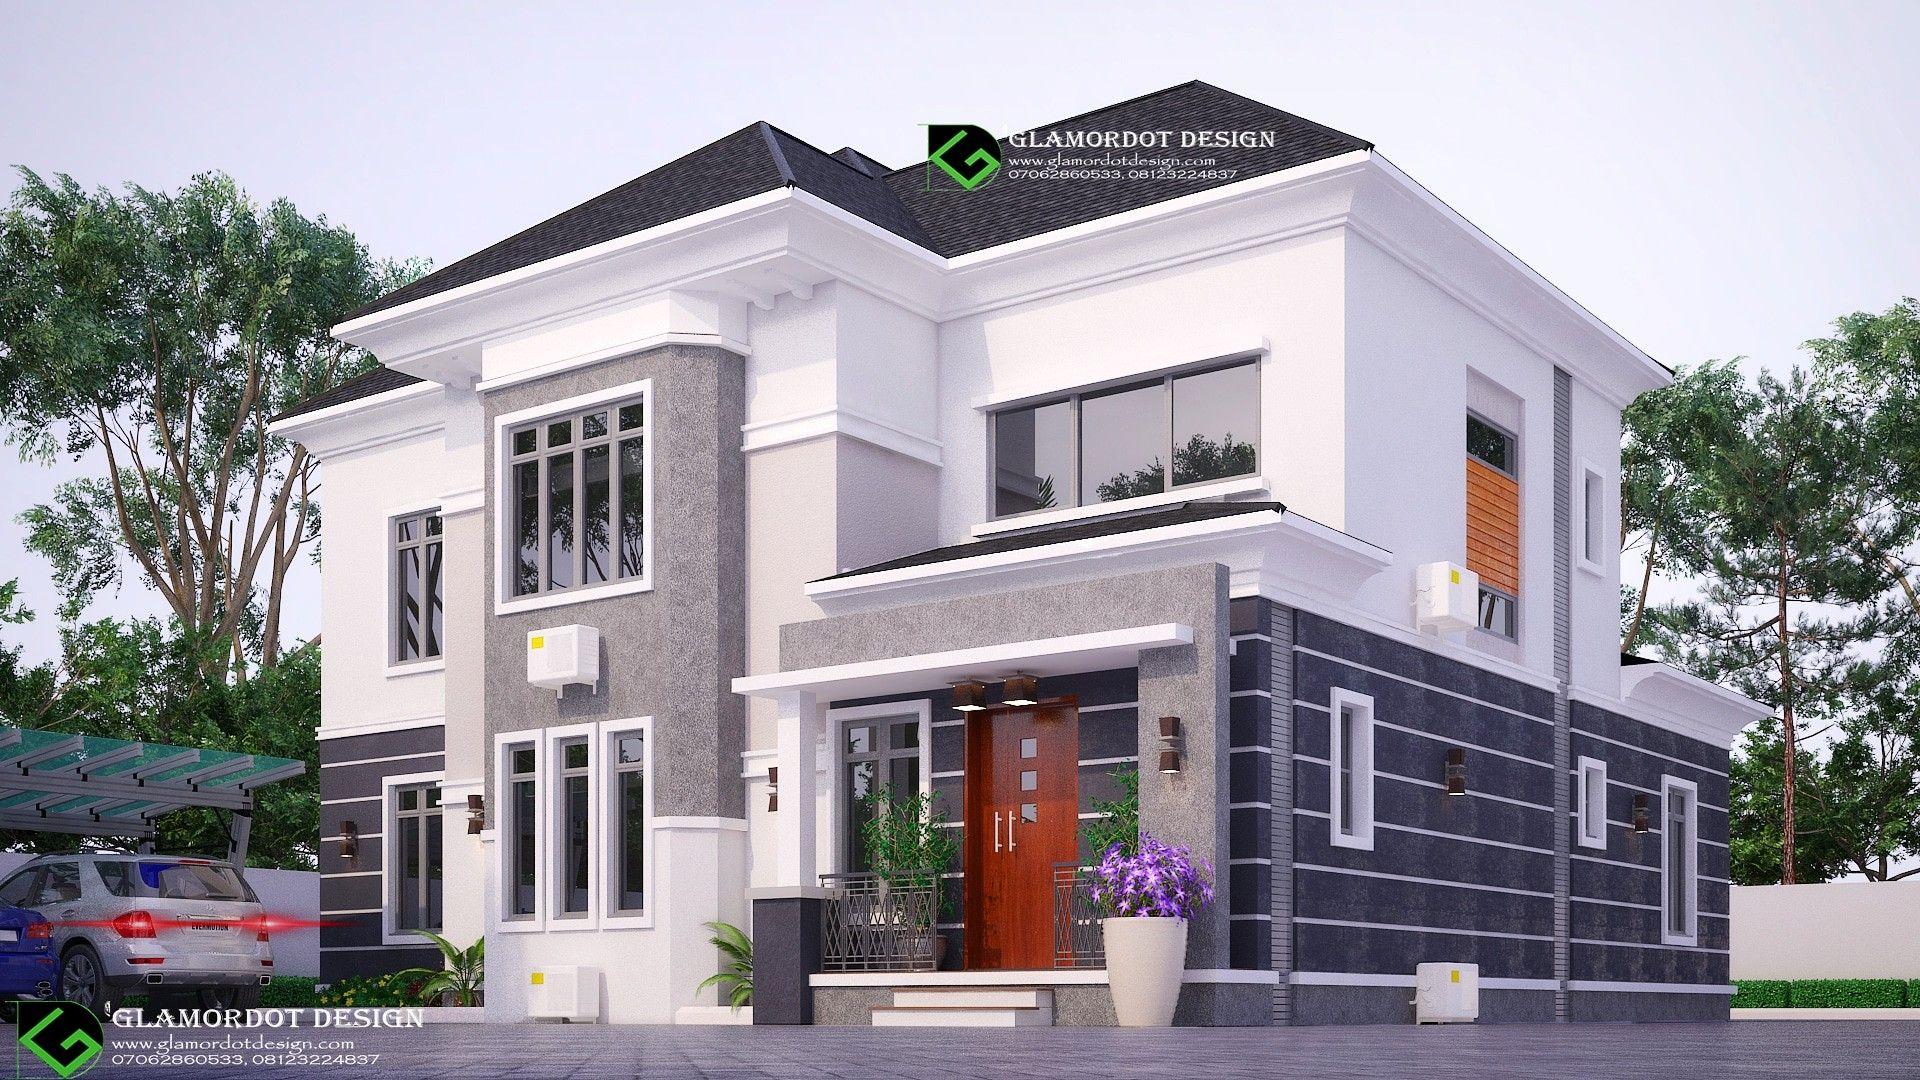 Architectural Design Of 6 Bedroom Duplex Nigeria Duplex Architect Houseplan Luxury Beautiful House Plans Duplex House Design House Construction Plan